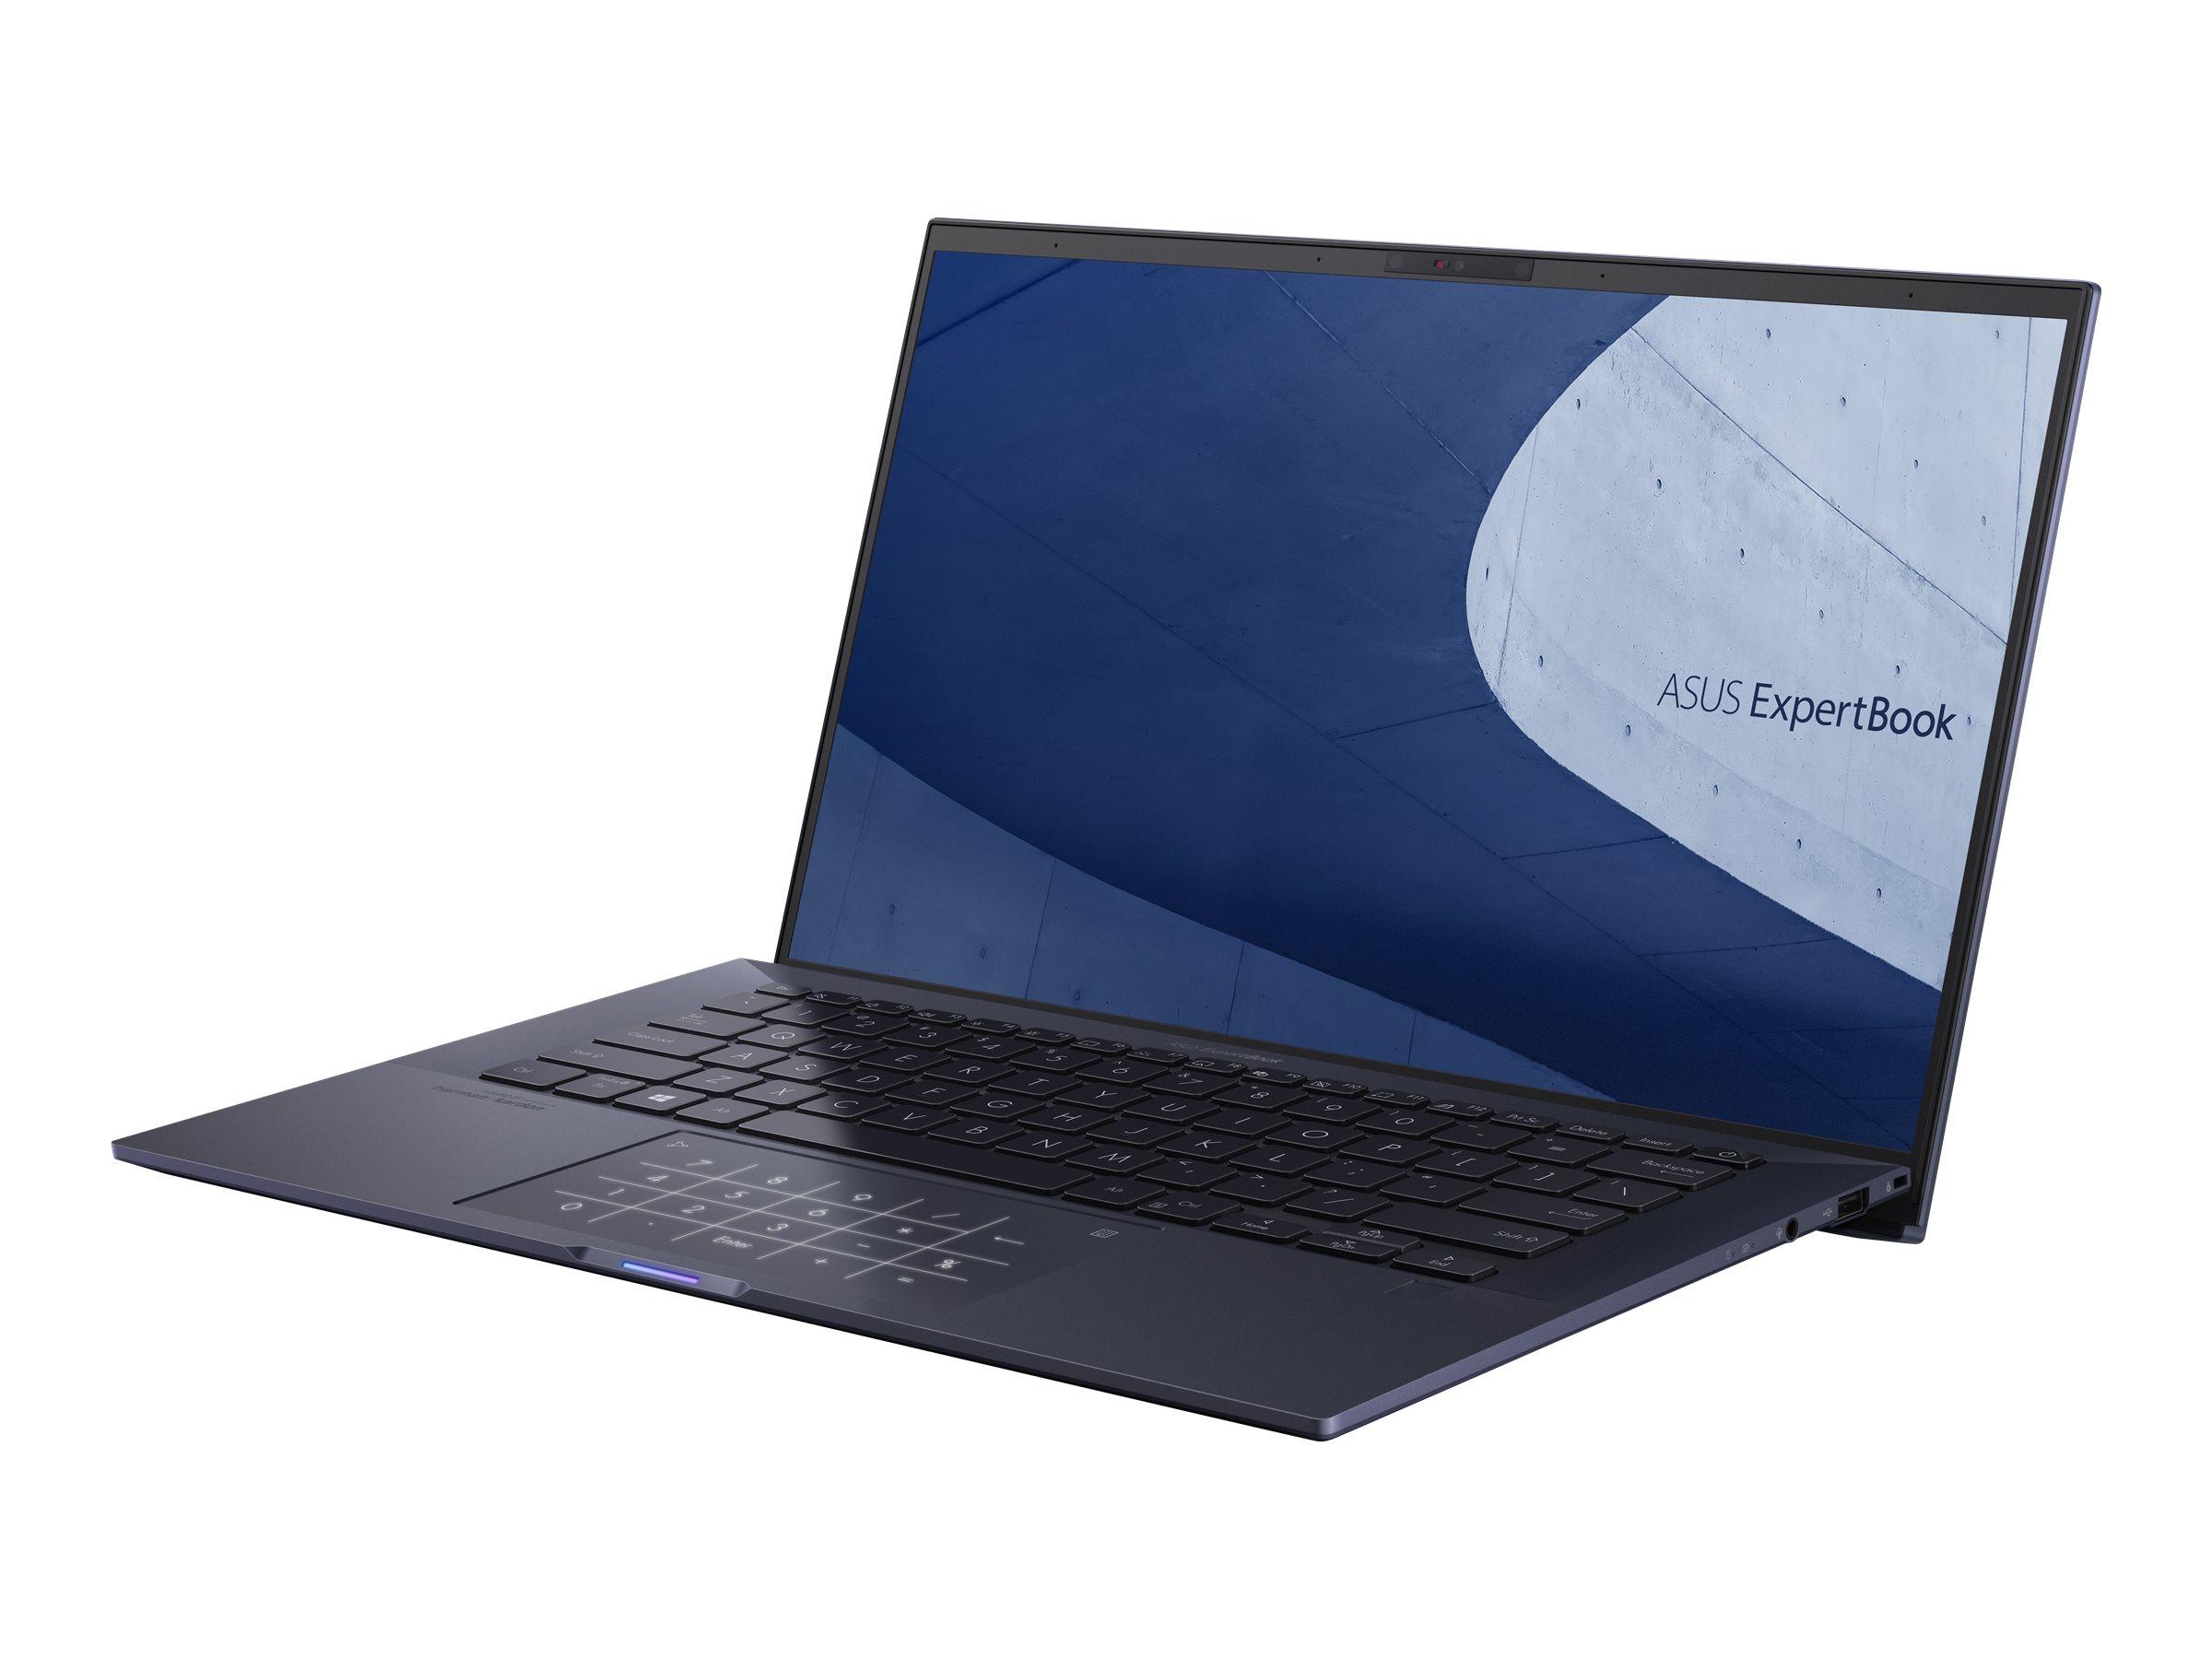 "ASUS ExpertBook B9450FA BM0483R - Core i7 10610U / 1.8 GHz - Win 10 Pro 64-Bit - 16 GB RAM - 1 TB SSD NVMe - 35.6 cm (14"")"